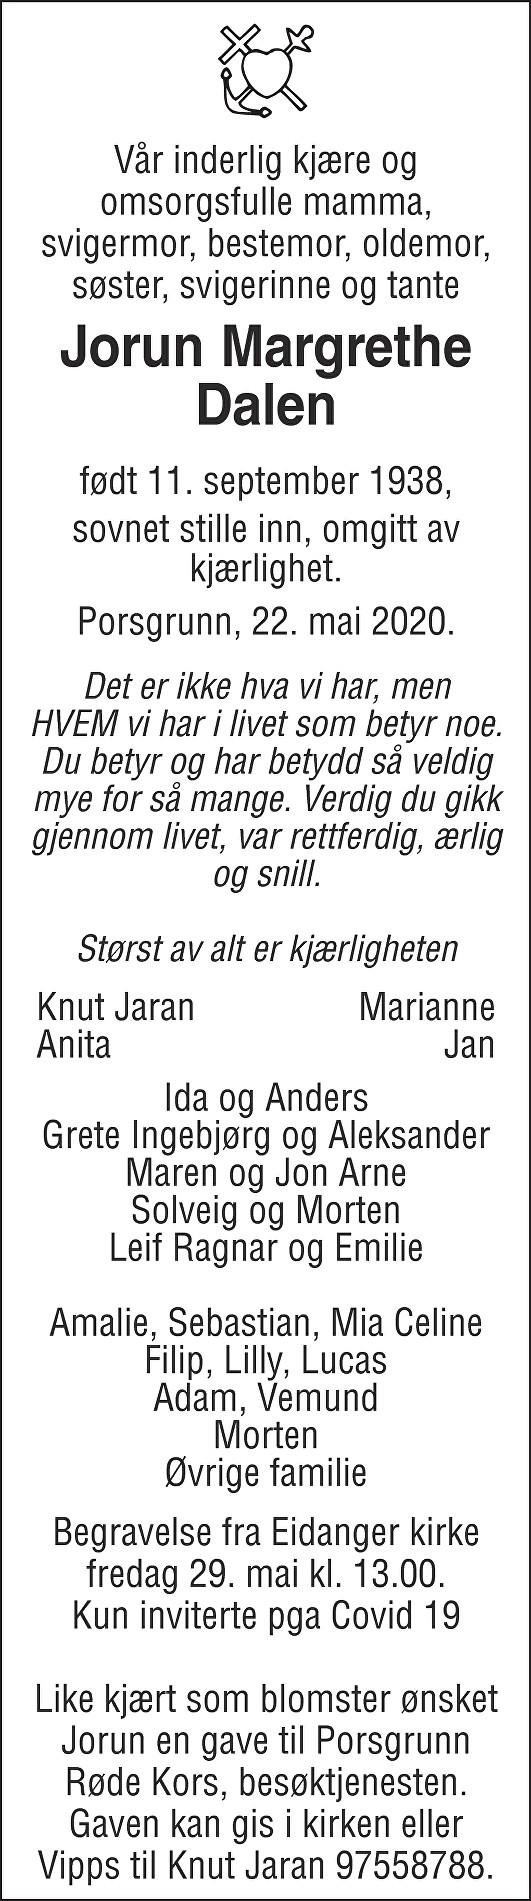 Jorun Margrethe Dalen Dødsannonse